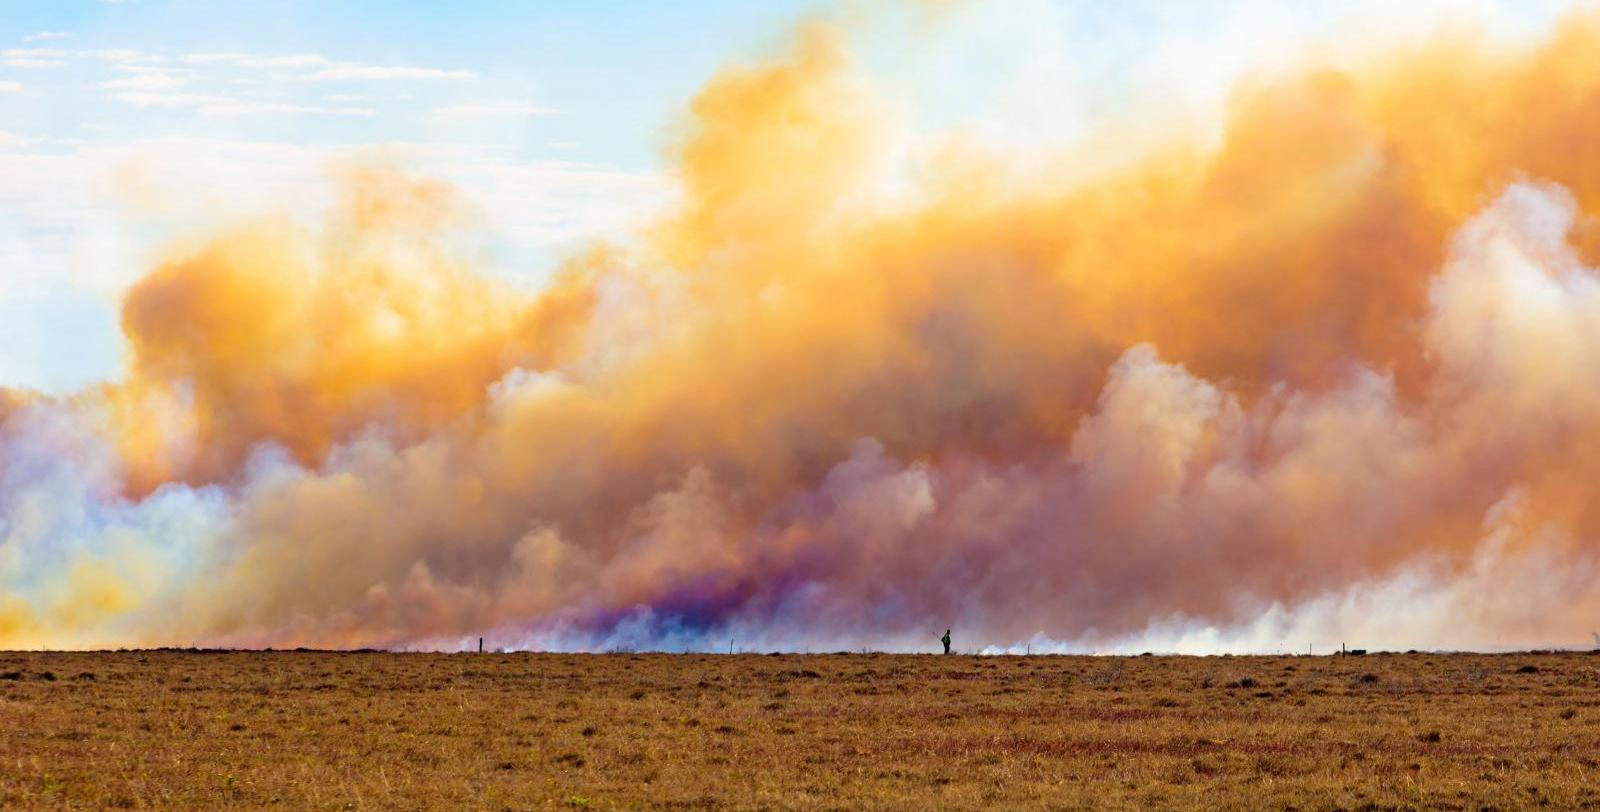 Malibu fires, California smoke and the warm, dry Santa Ana winds